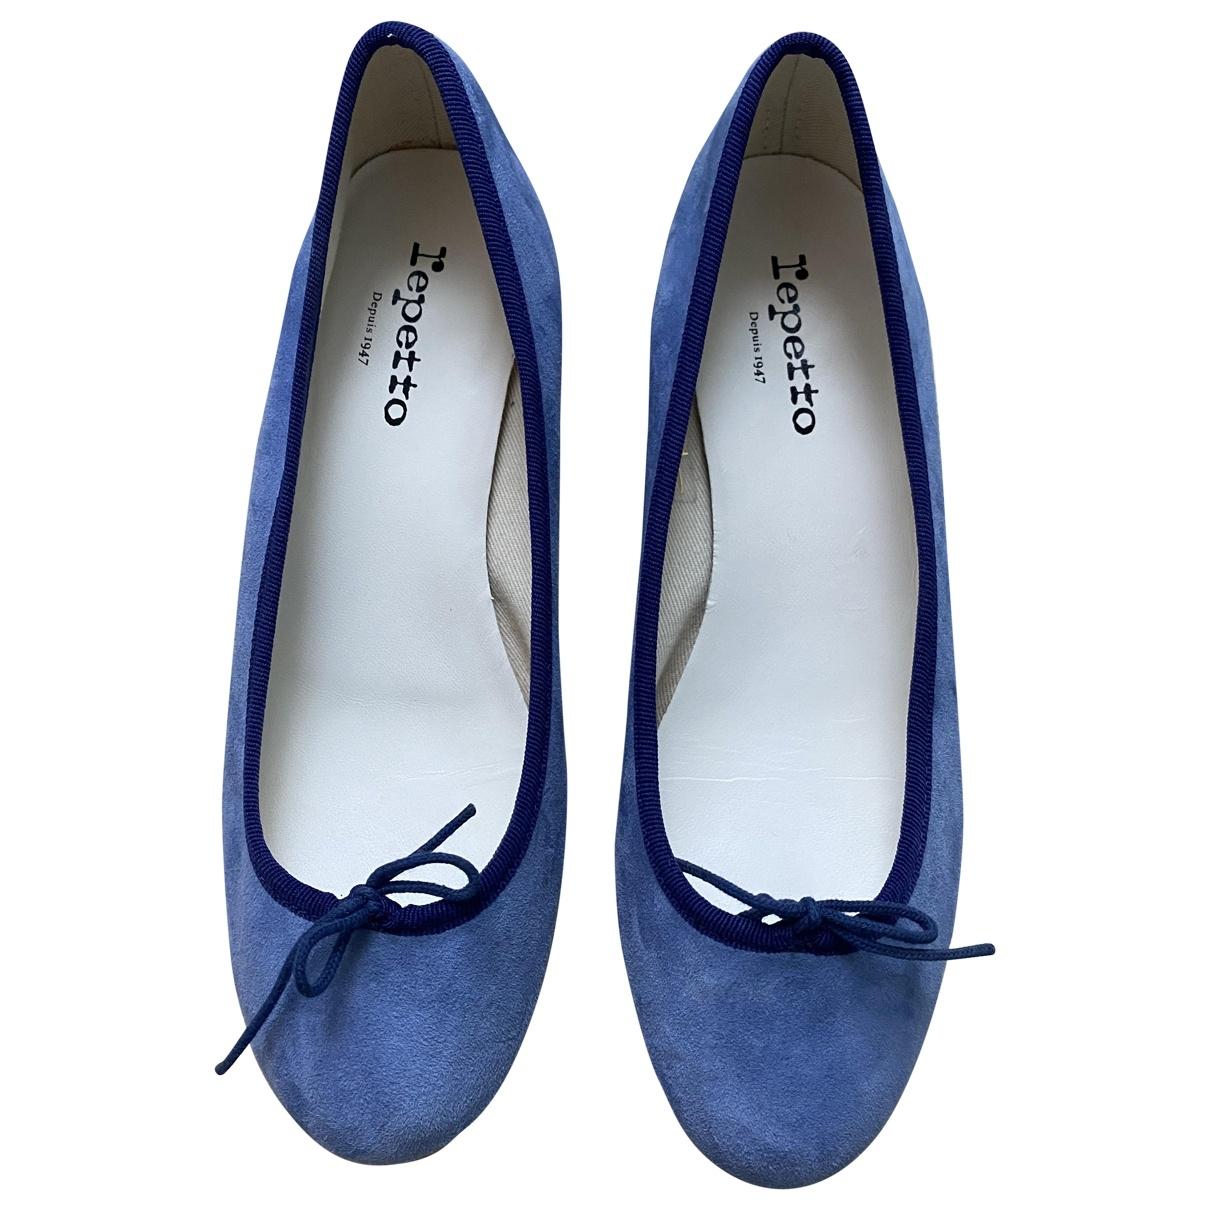 Repetto - Ballerines   pour femme en suede - bleu